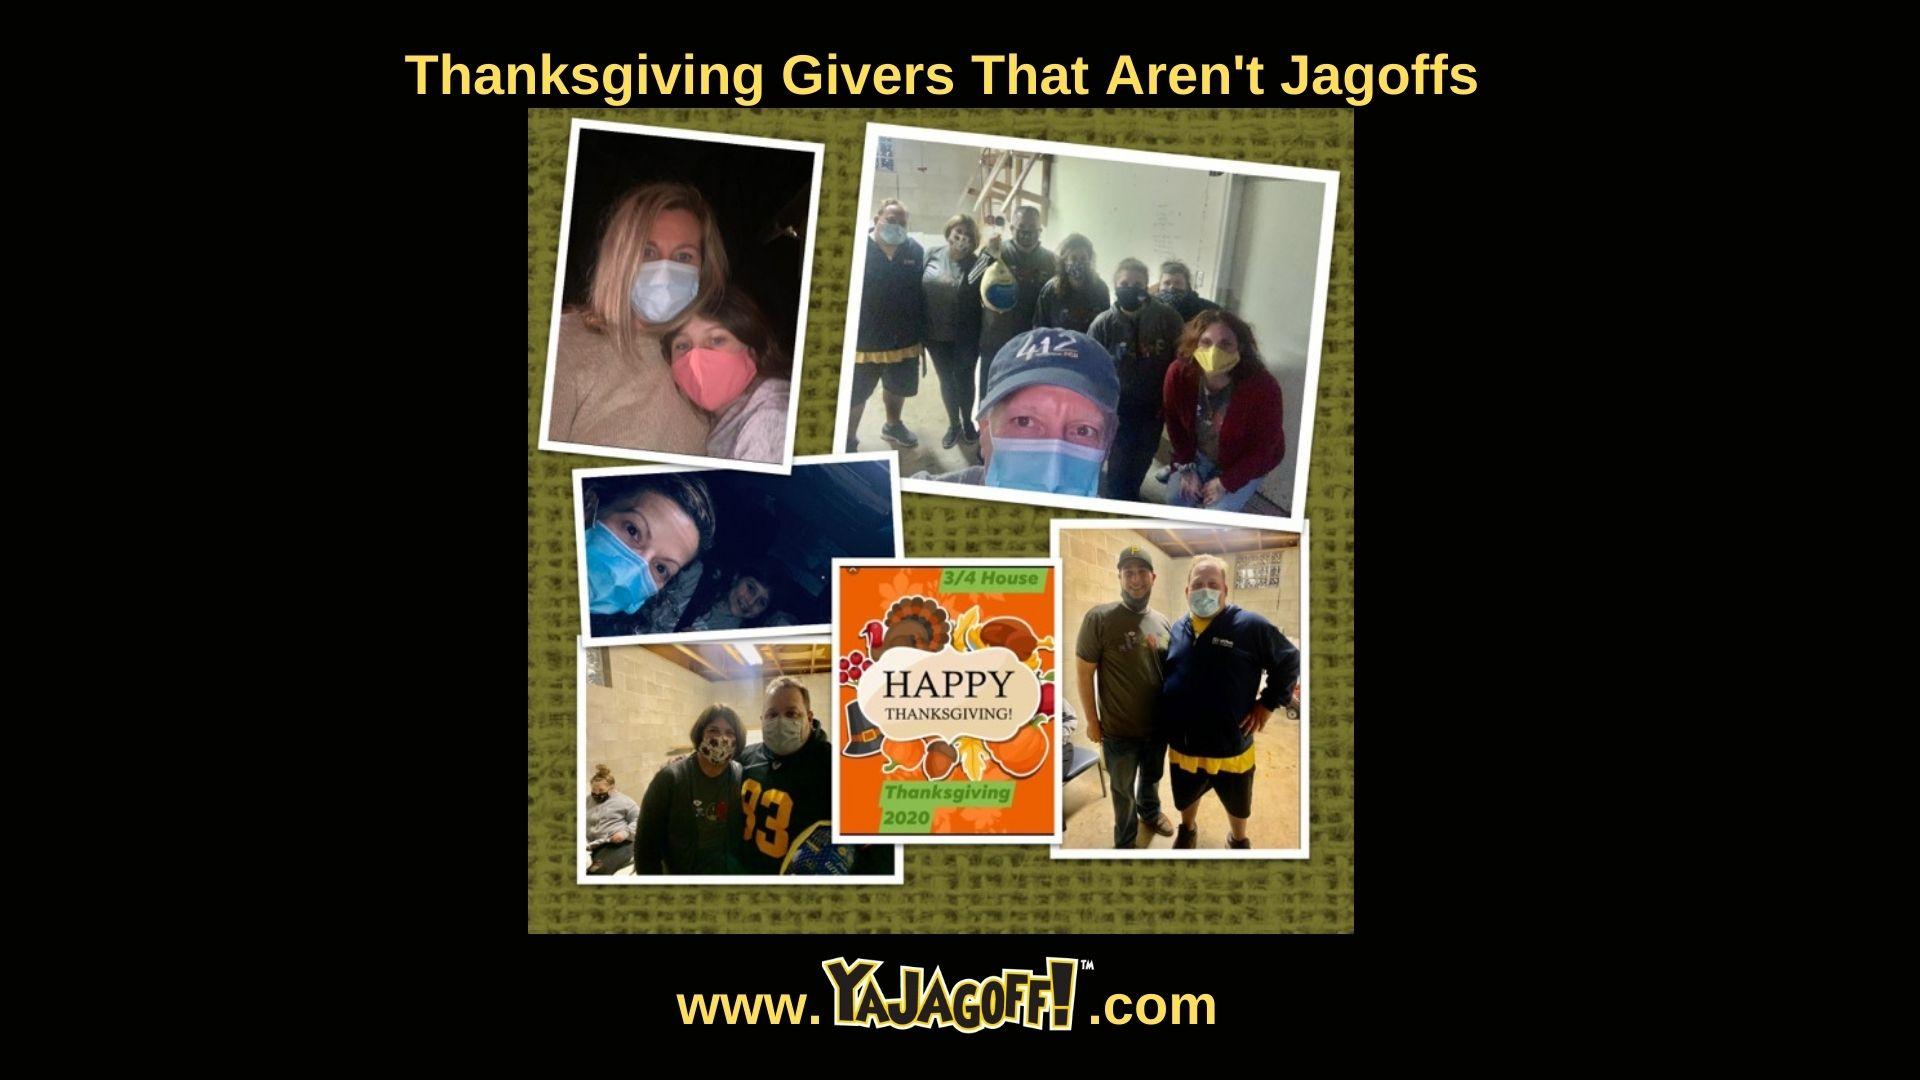 YaJagpff Blog Thanksgiving photo